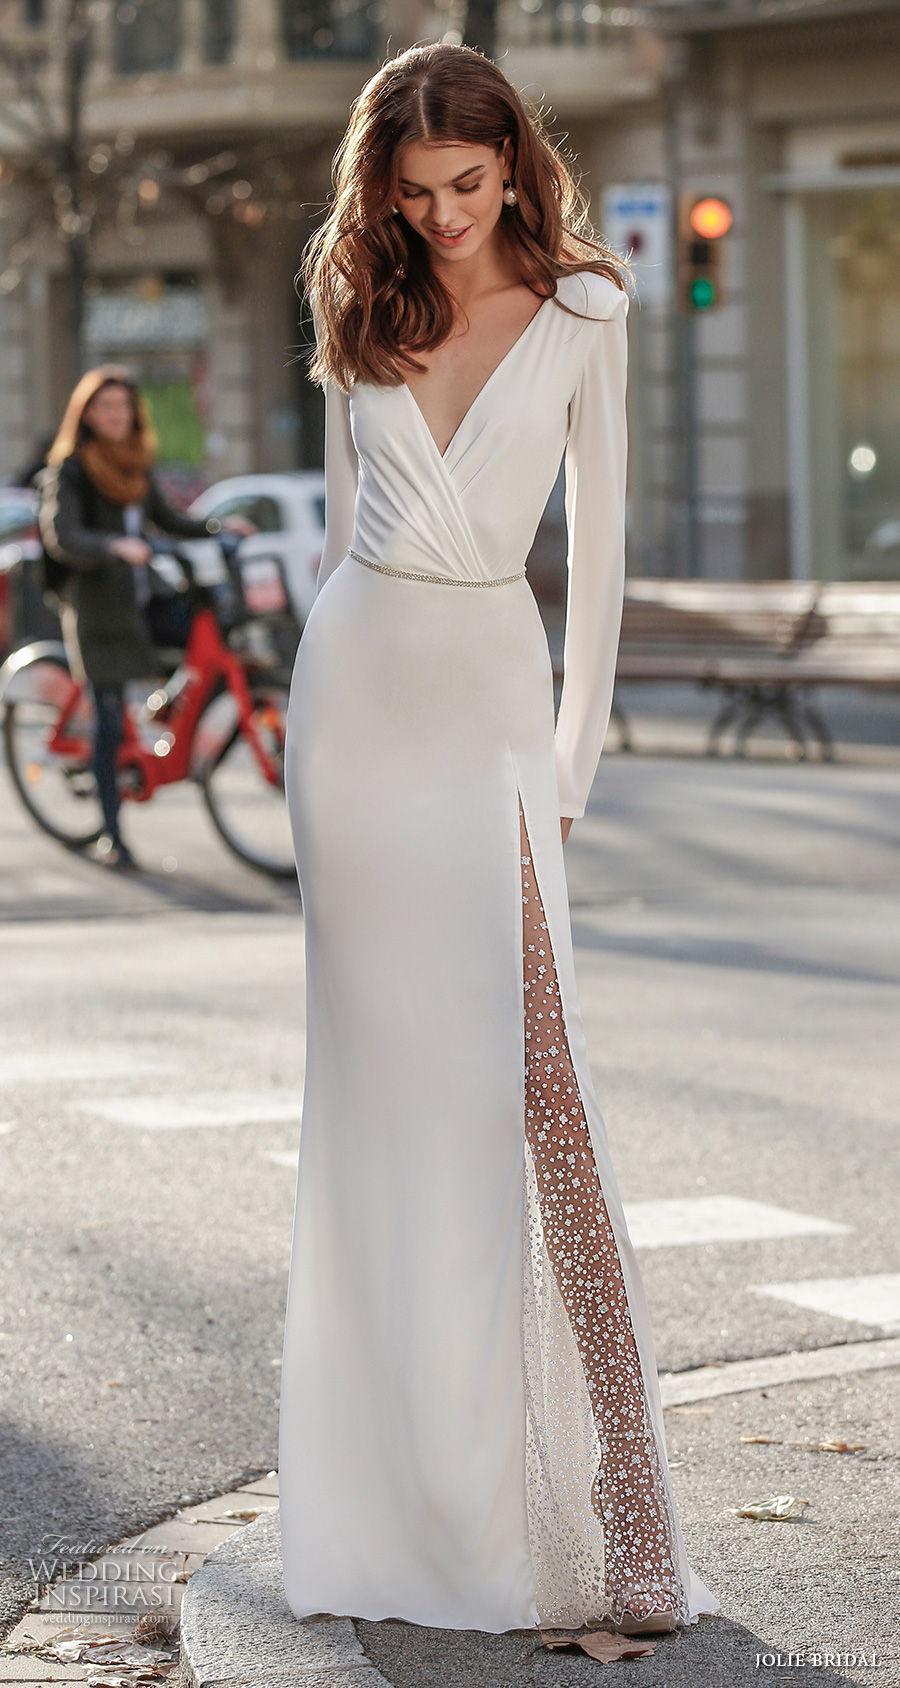 jolie spring 2021 bridal long sleeves deep v neck wrap over bodice simple minimalist slit skirt elegant sheath wedding dress v back sweep train (11) mv